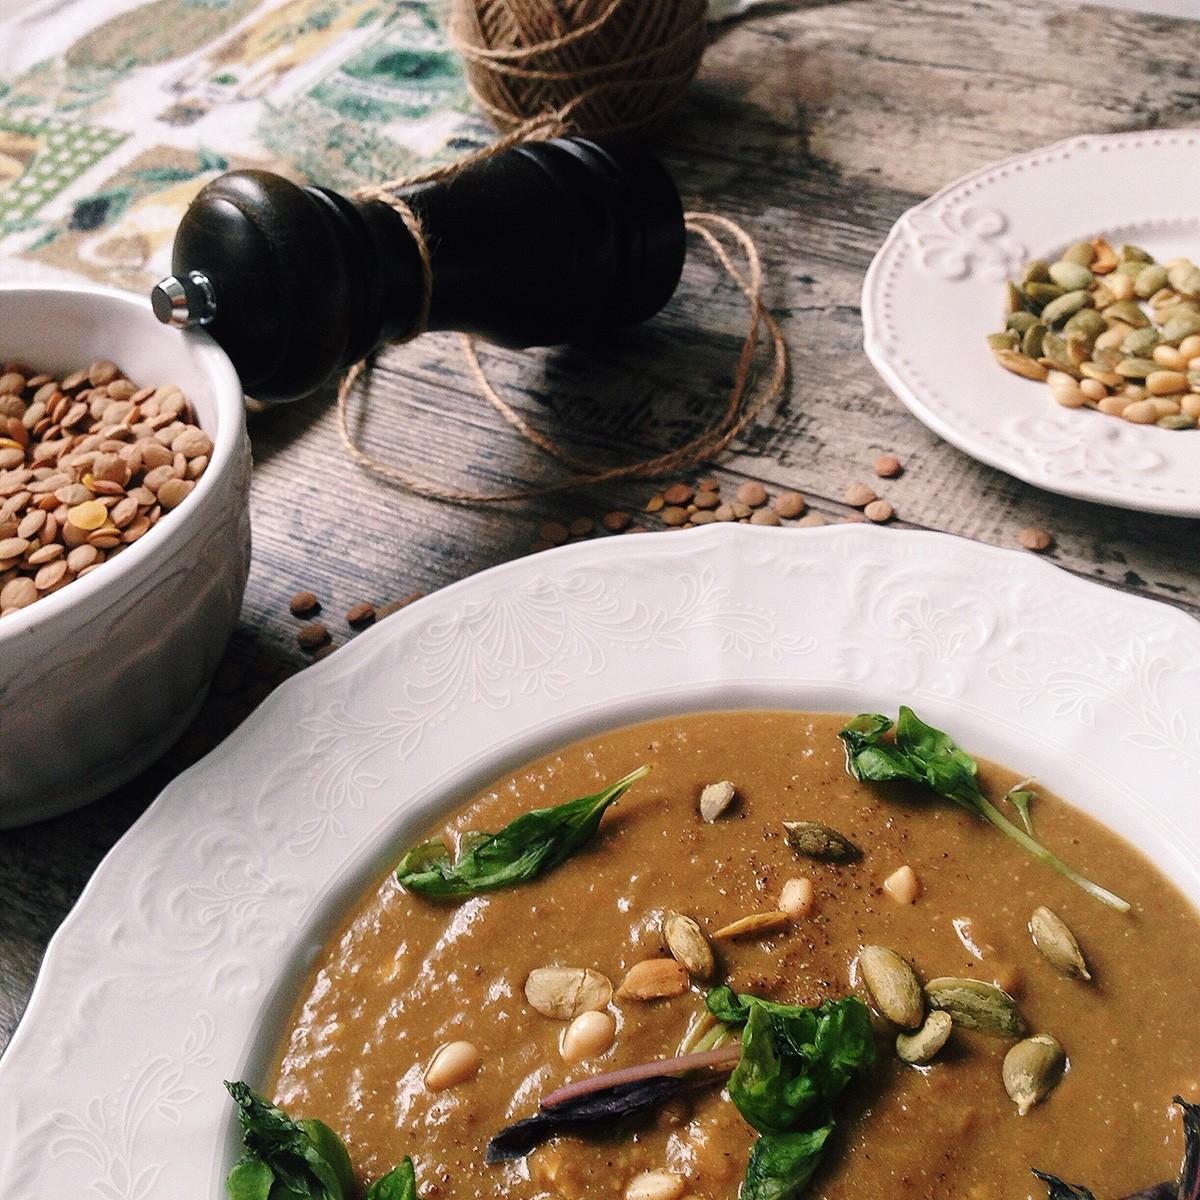 Рецепты из чечевицы с фото пошагово